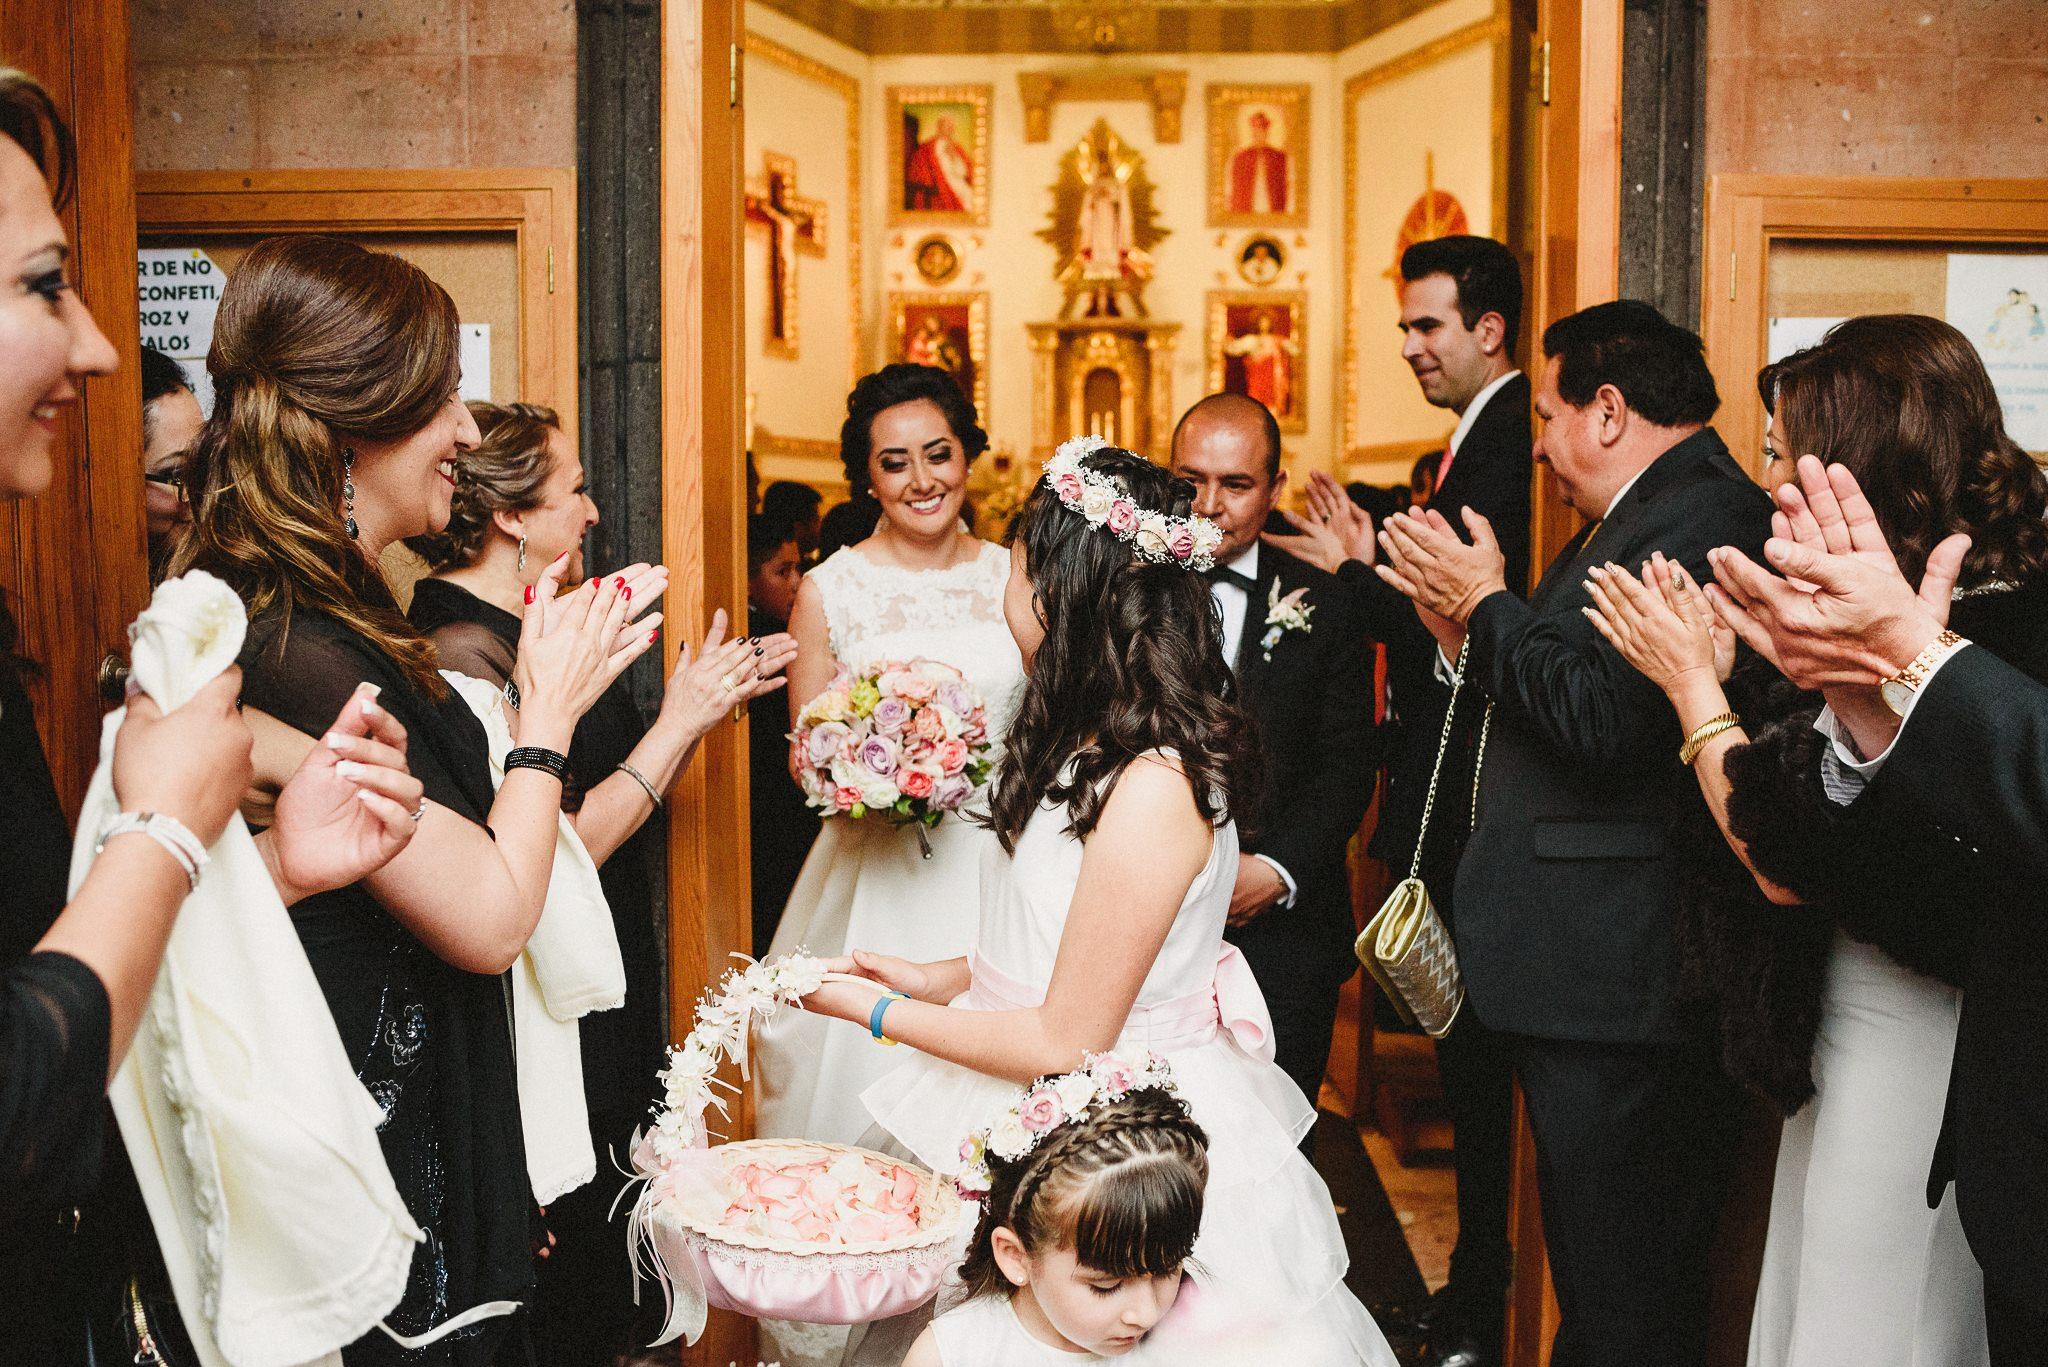 Wedding-Boda-Tulancingo-Hidalgo-Salon-Essenzia-Luis-Houdin-32-film